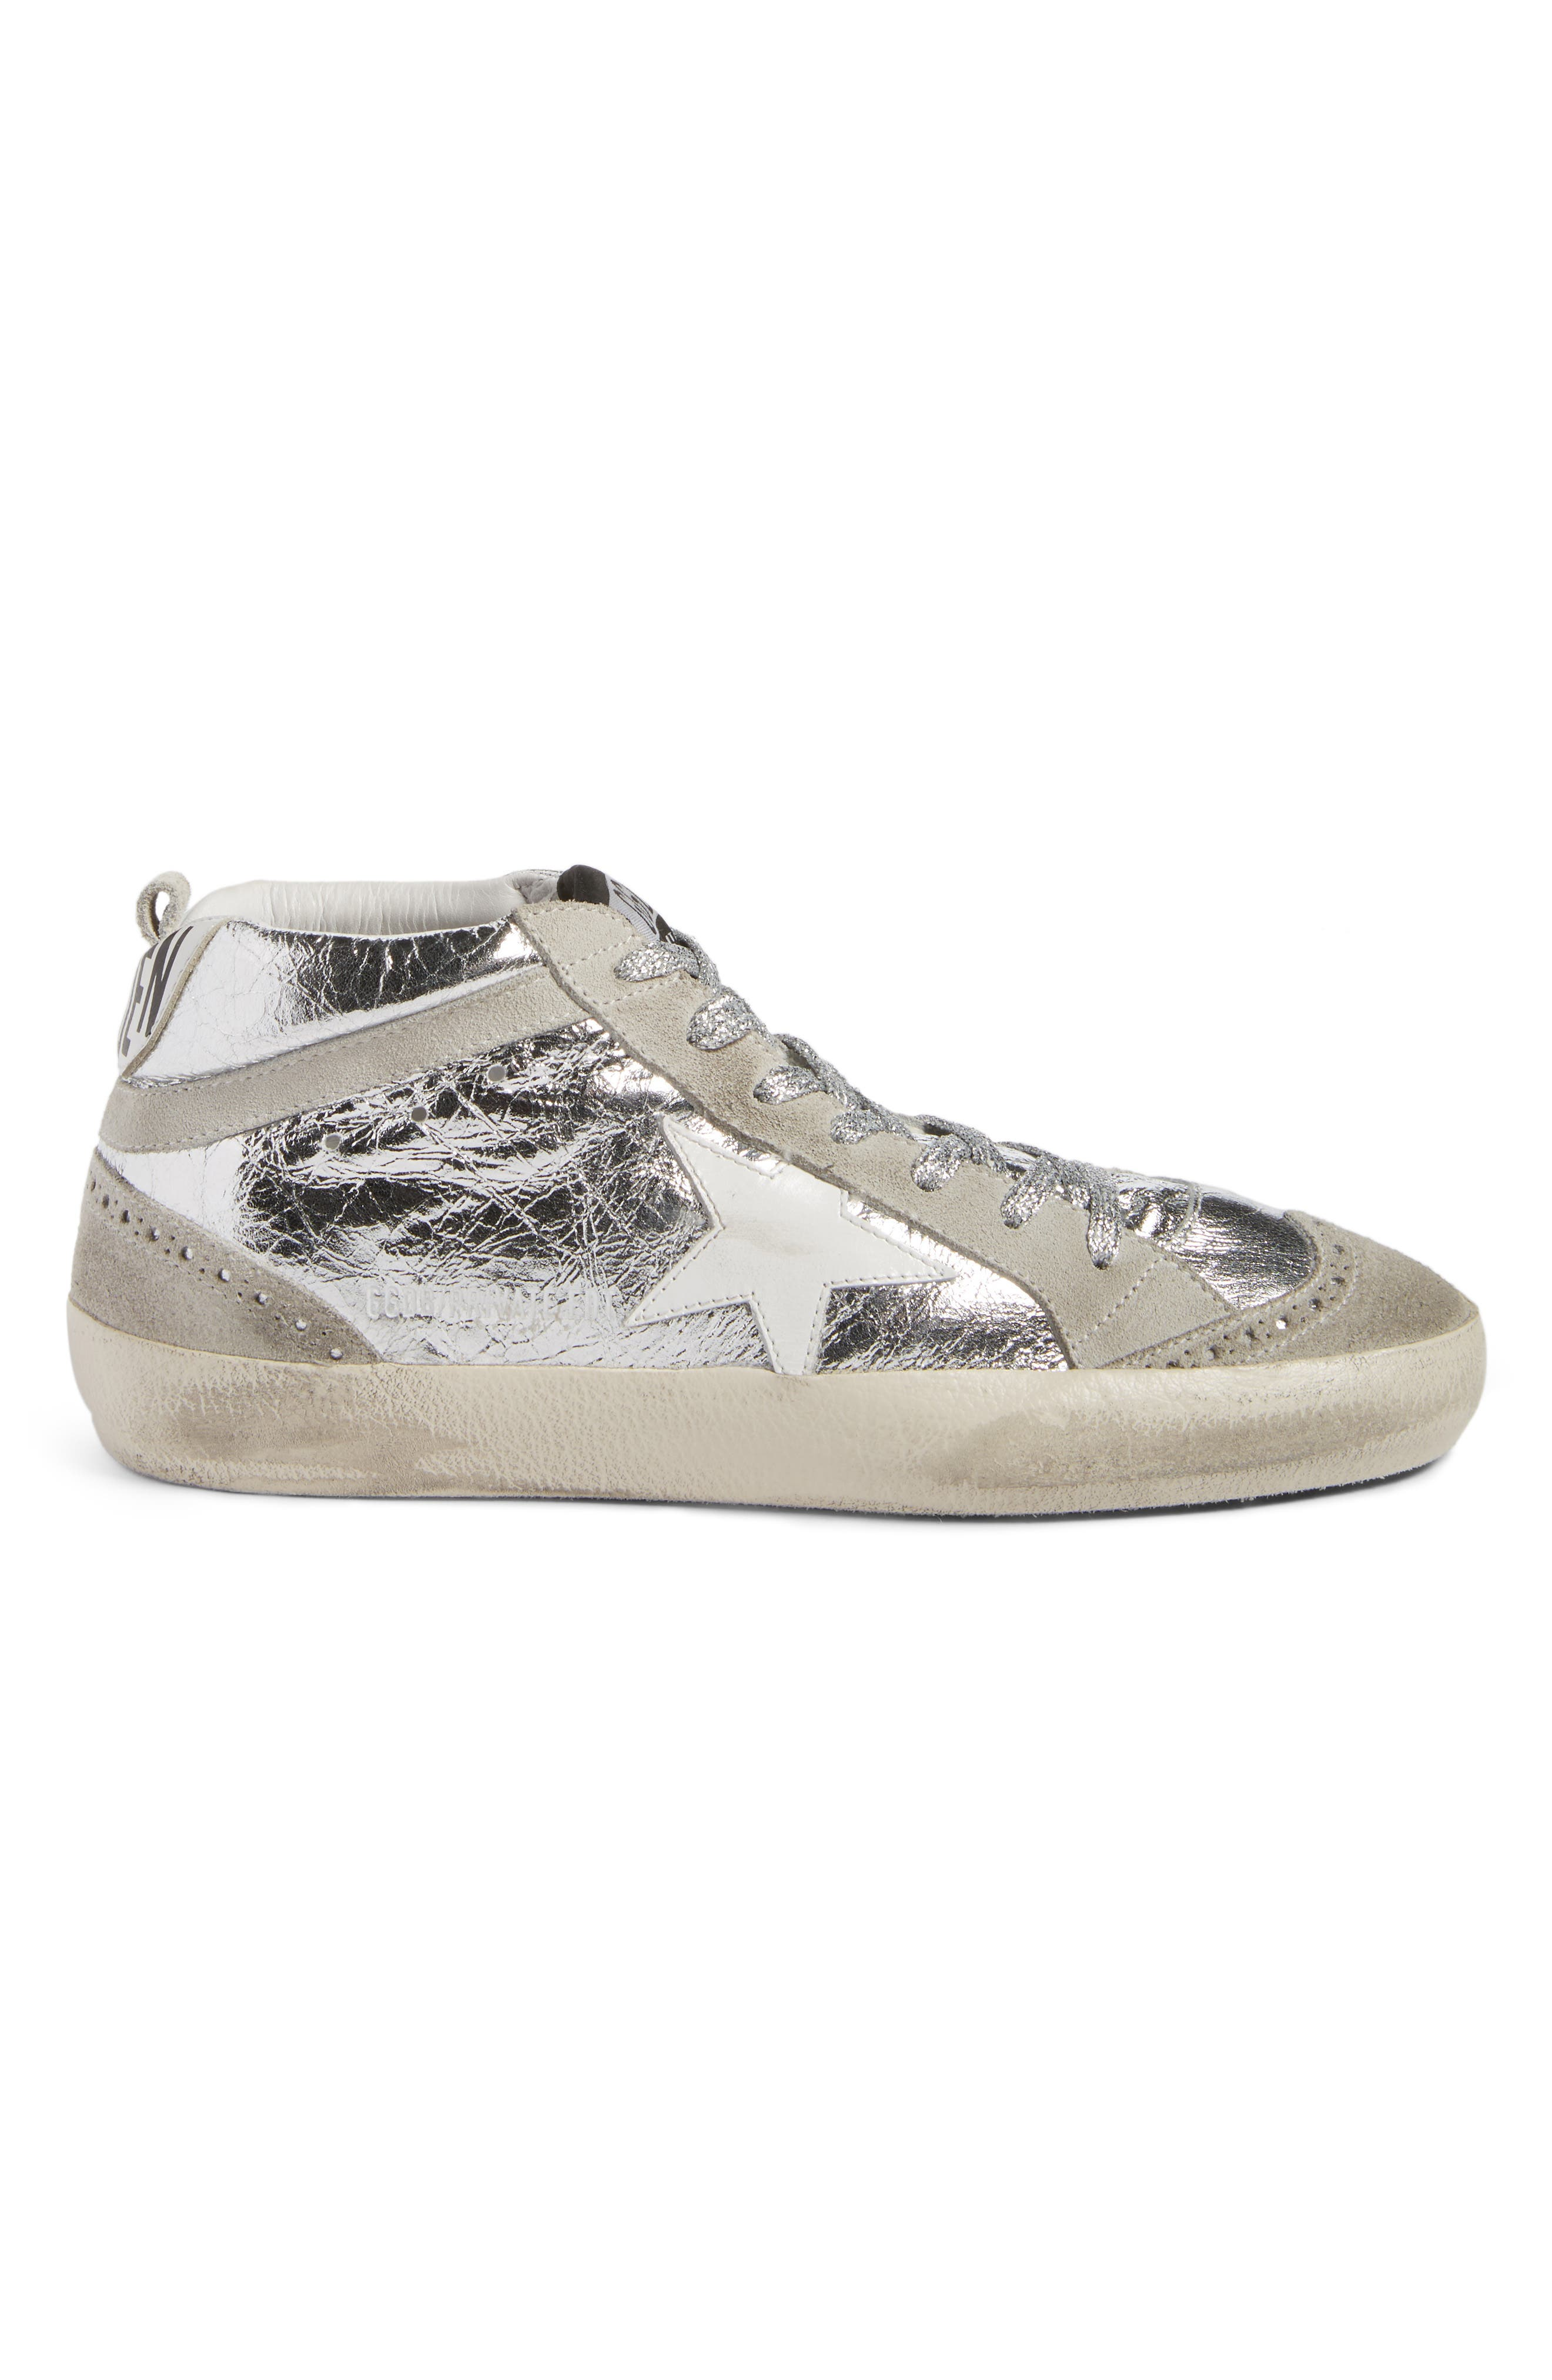 Alternate Image 3  - Golden Goose Mid Star Metallic Sneaker (Women)